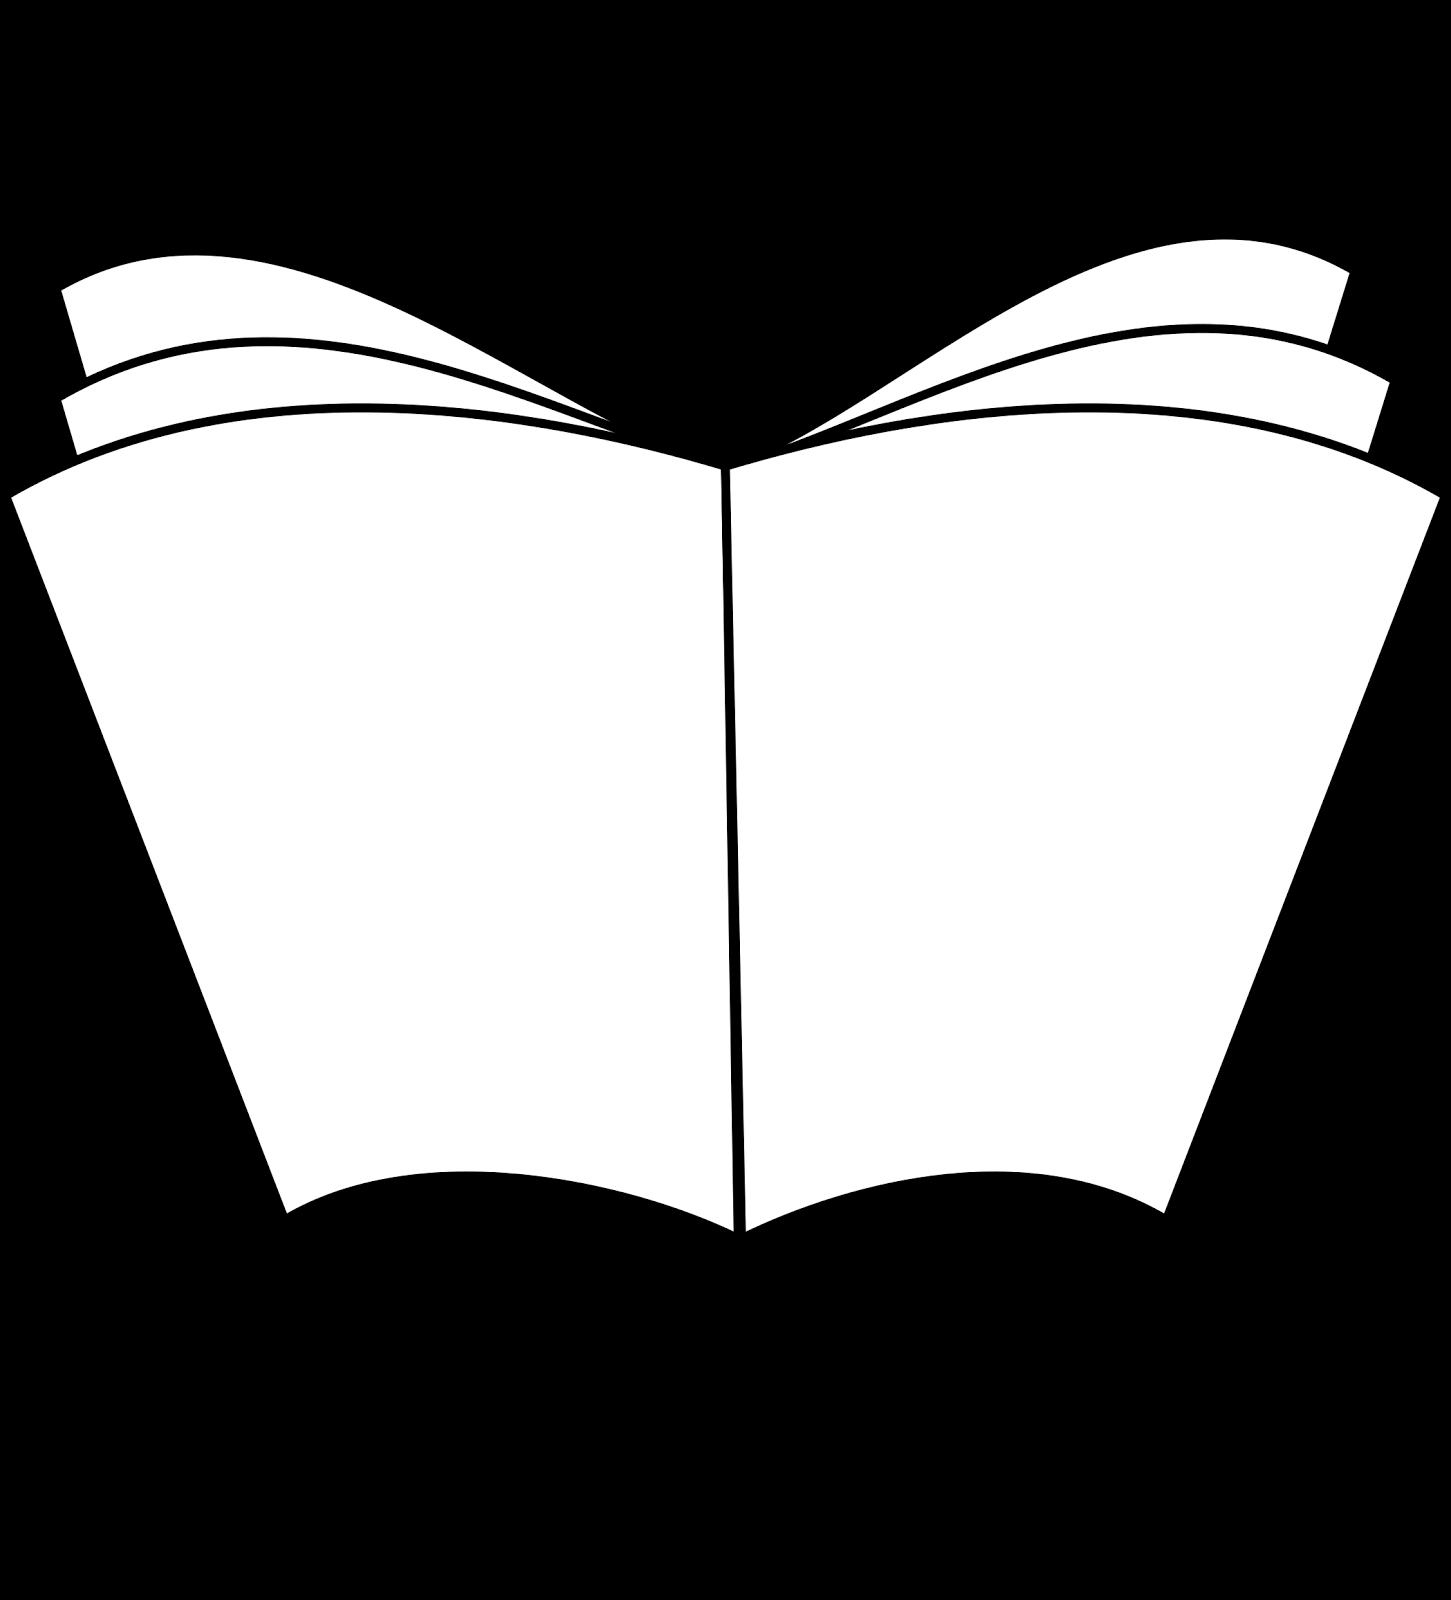 Biblioteca Escolar Colegio Maestro La Sierra